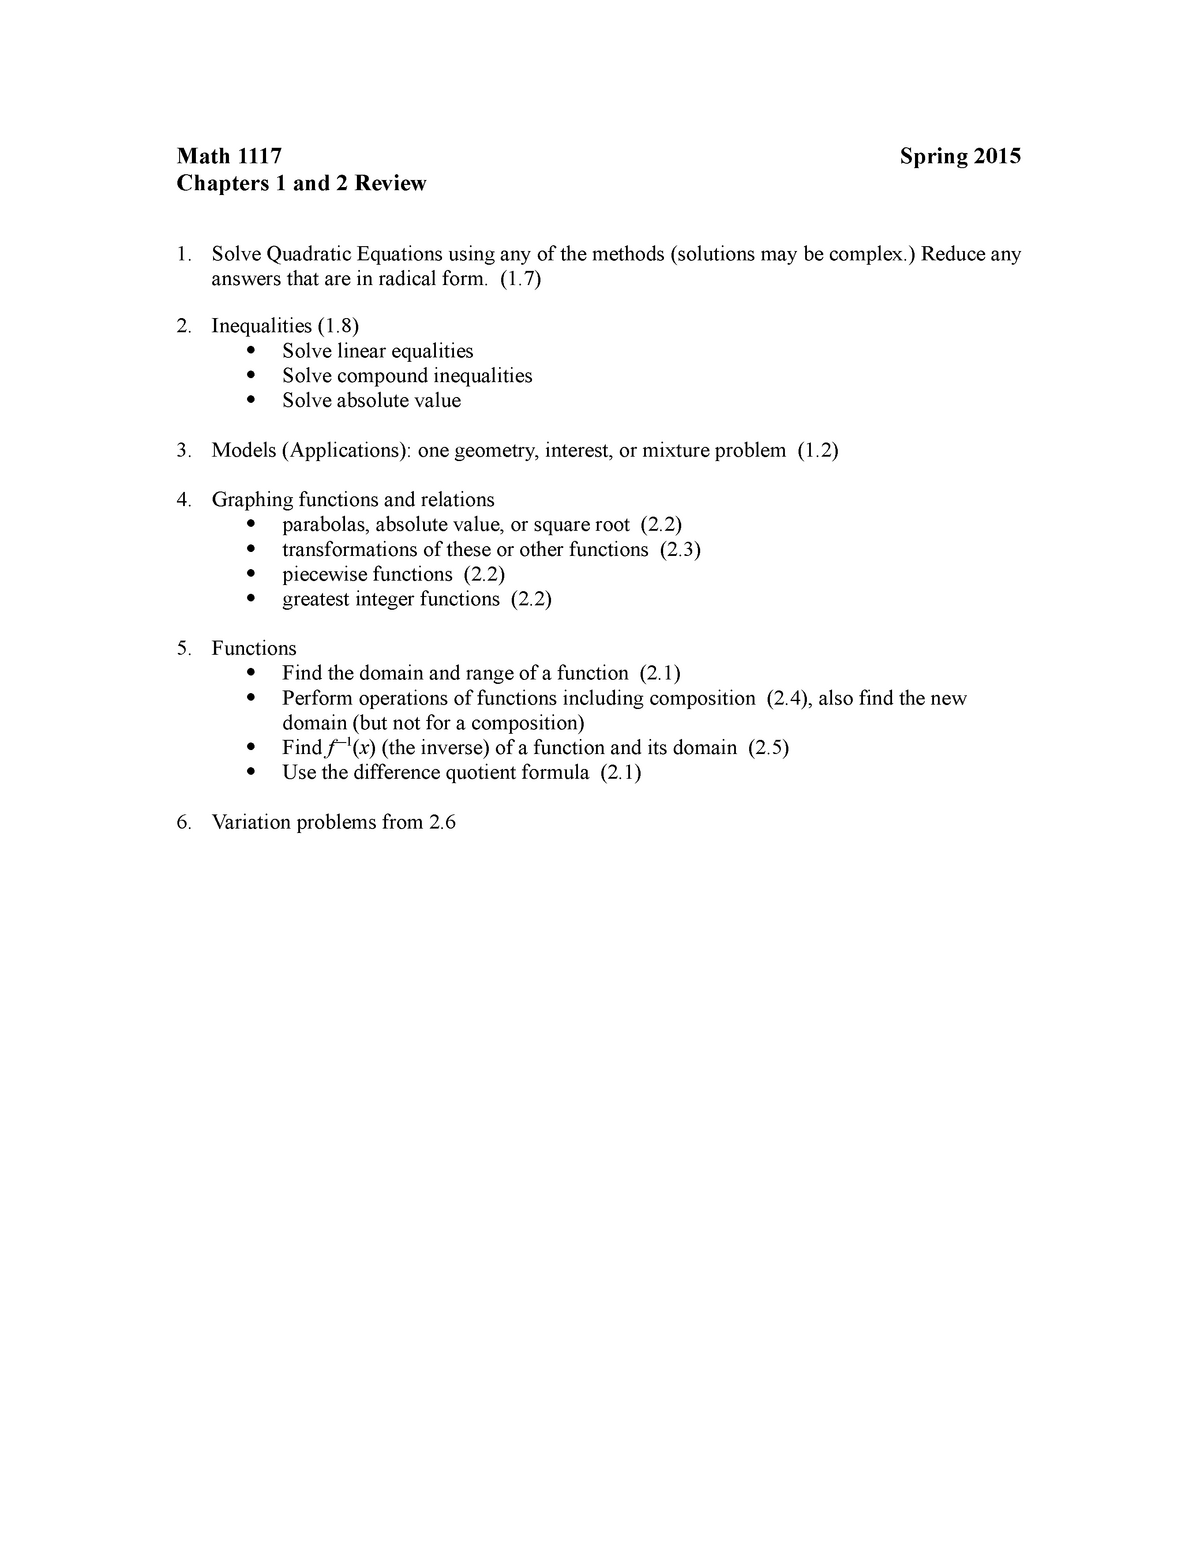 Math 1117 Review 1 and 2 - MATH 1117: Precalculus - StuDocu